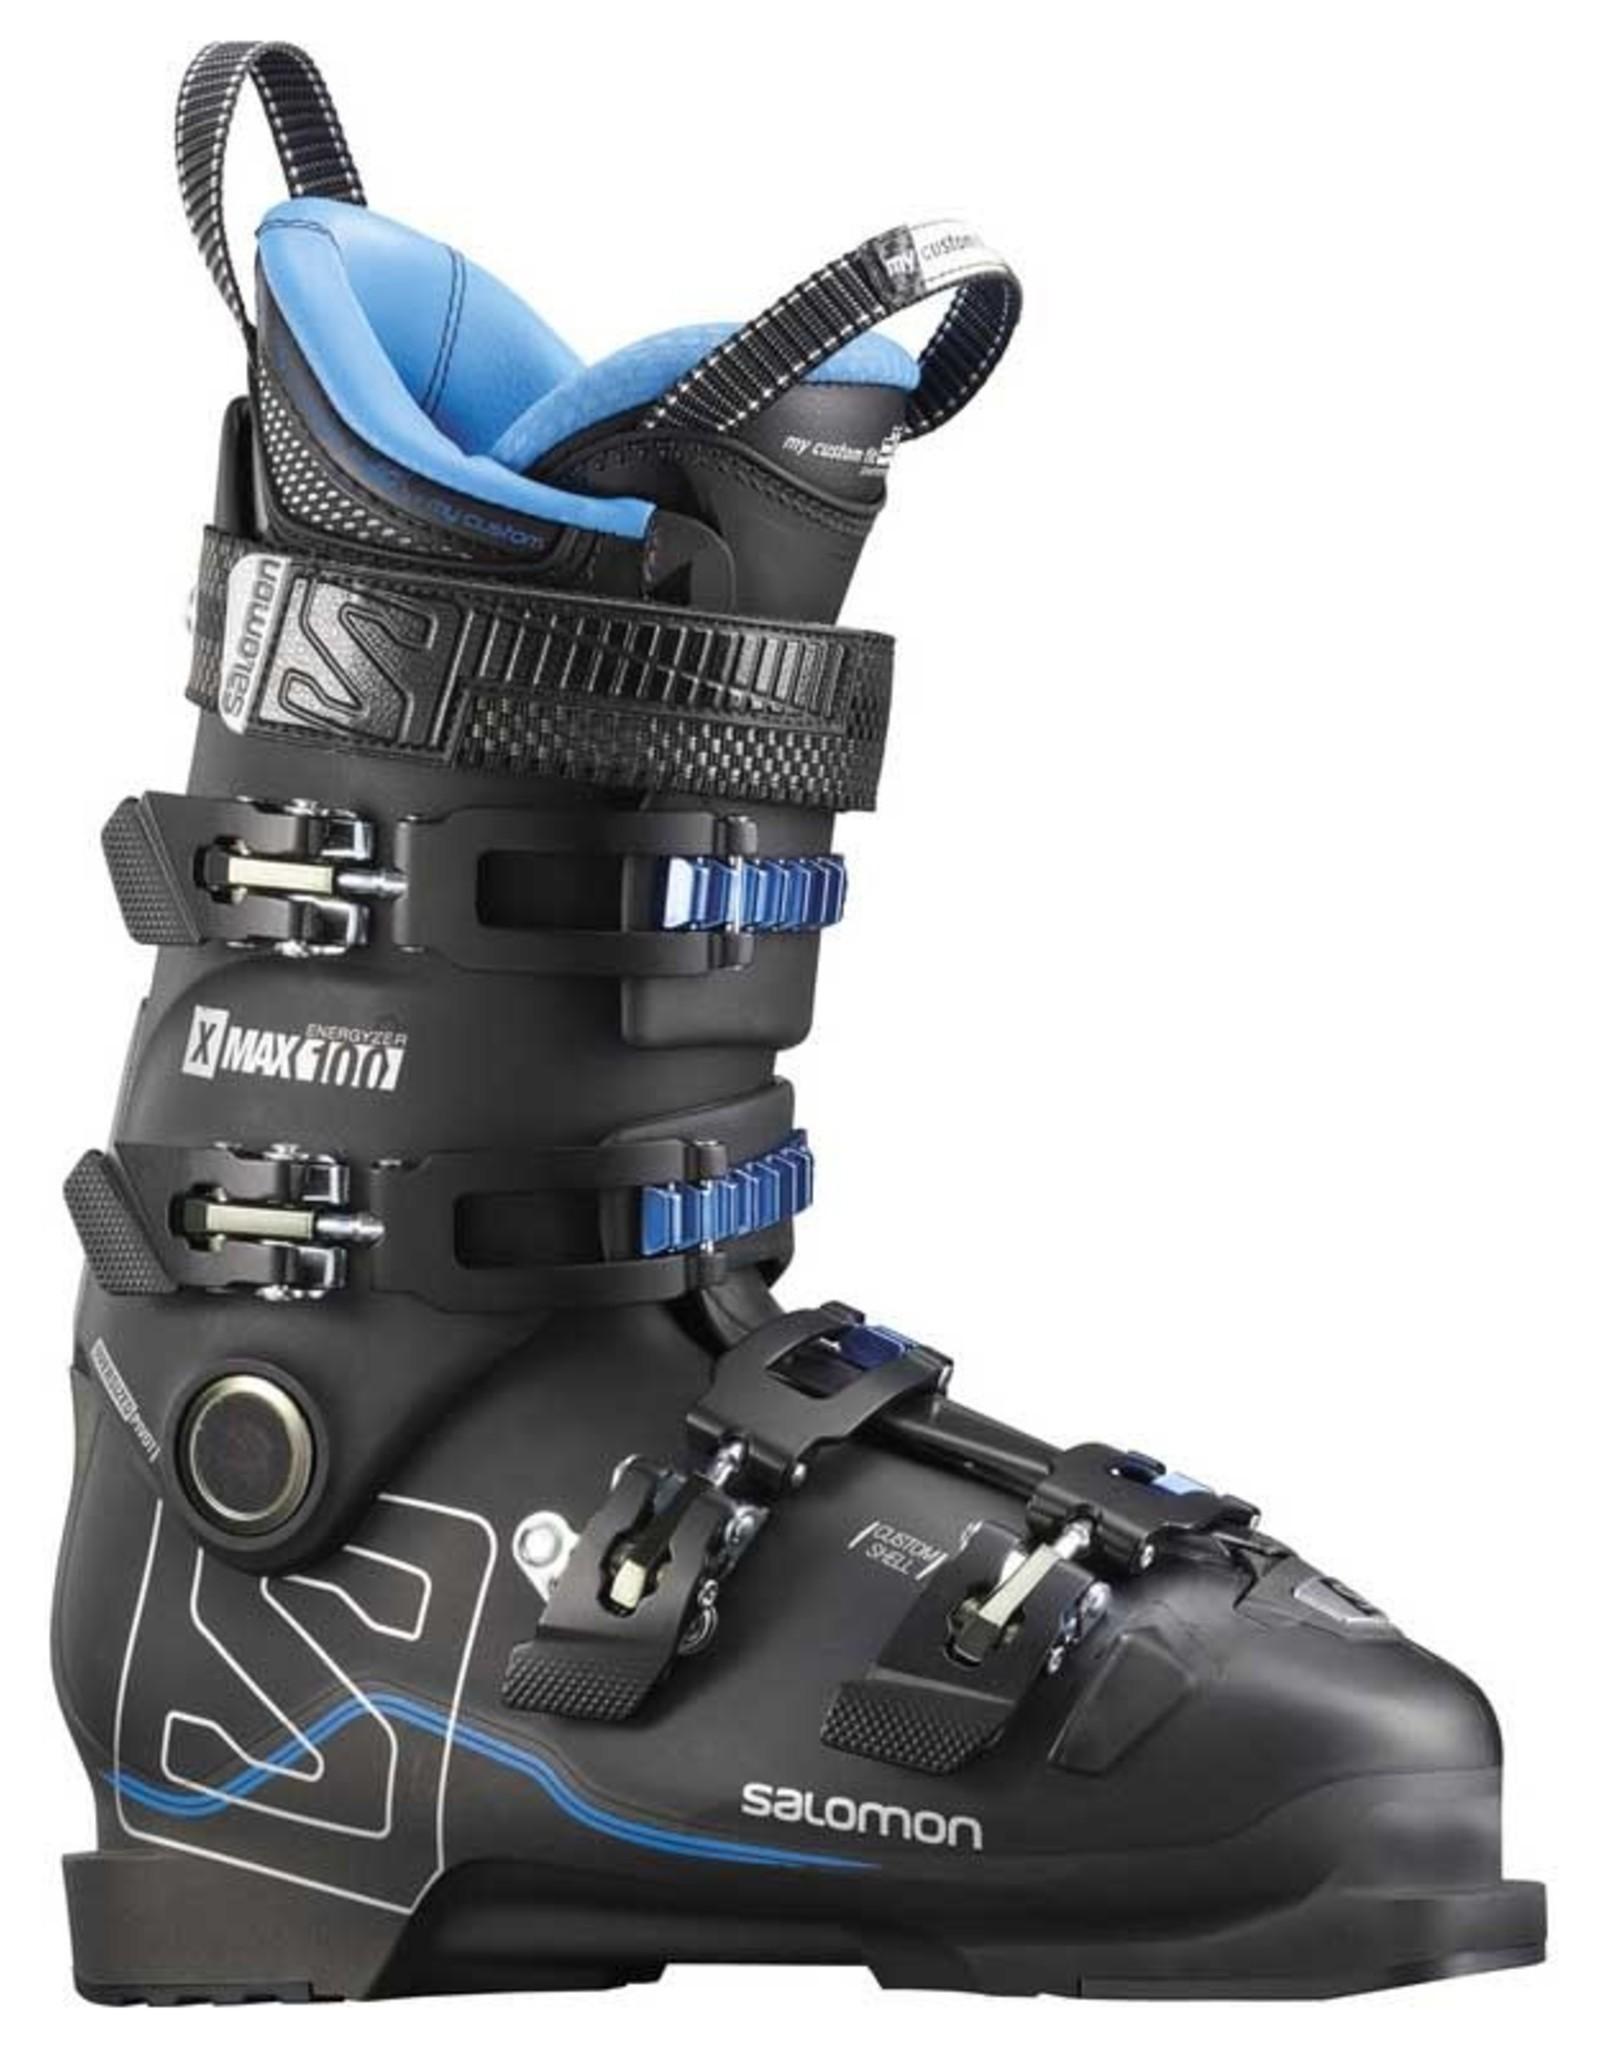 Salomon SALOMON Ski Boots X MAX 100 (17/18)